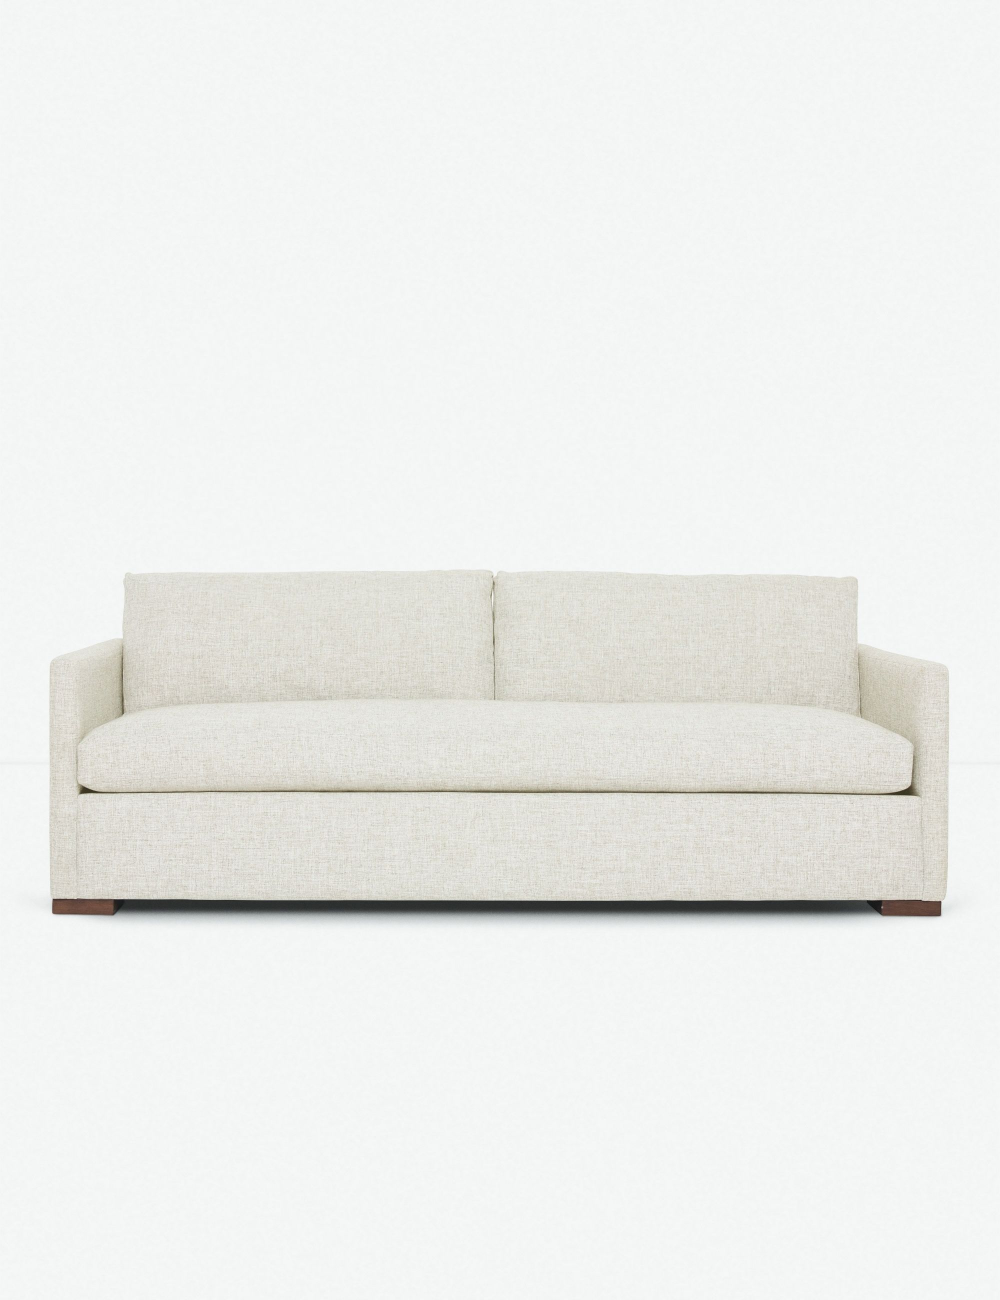 Callahan Sofa Sand In 2020 Sofa Comfy Sofa Velvet Furniture